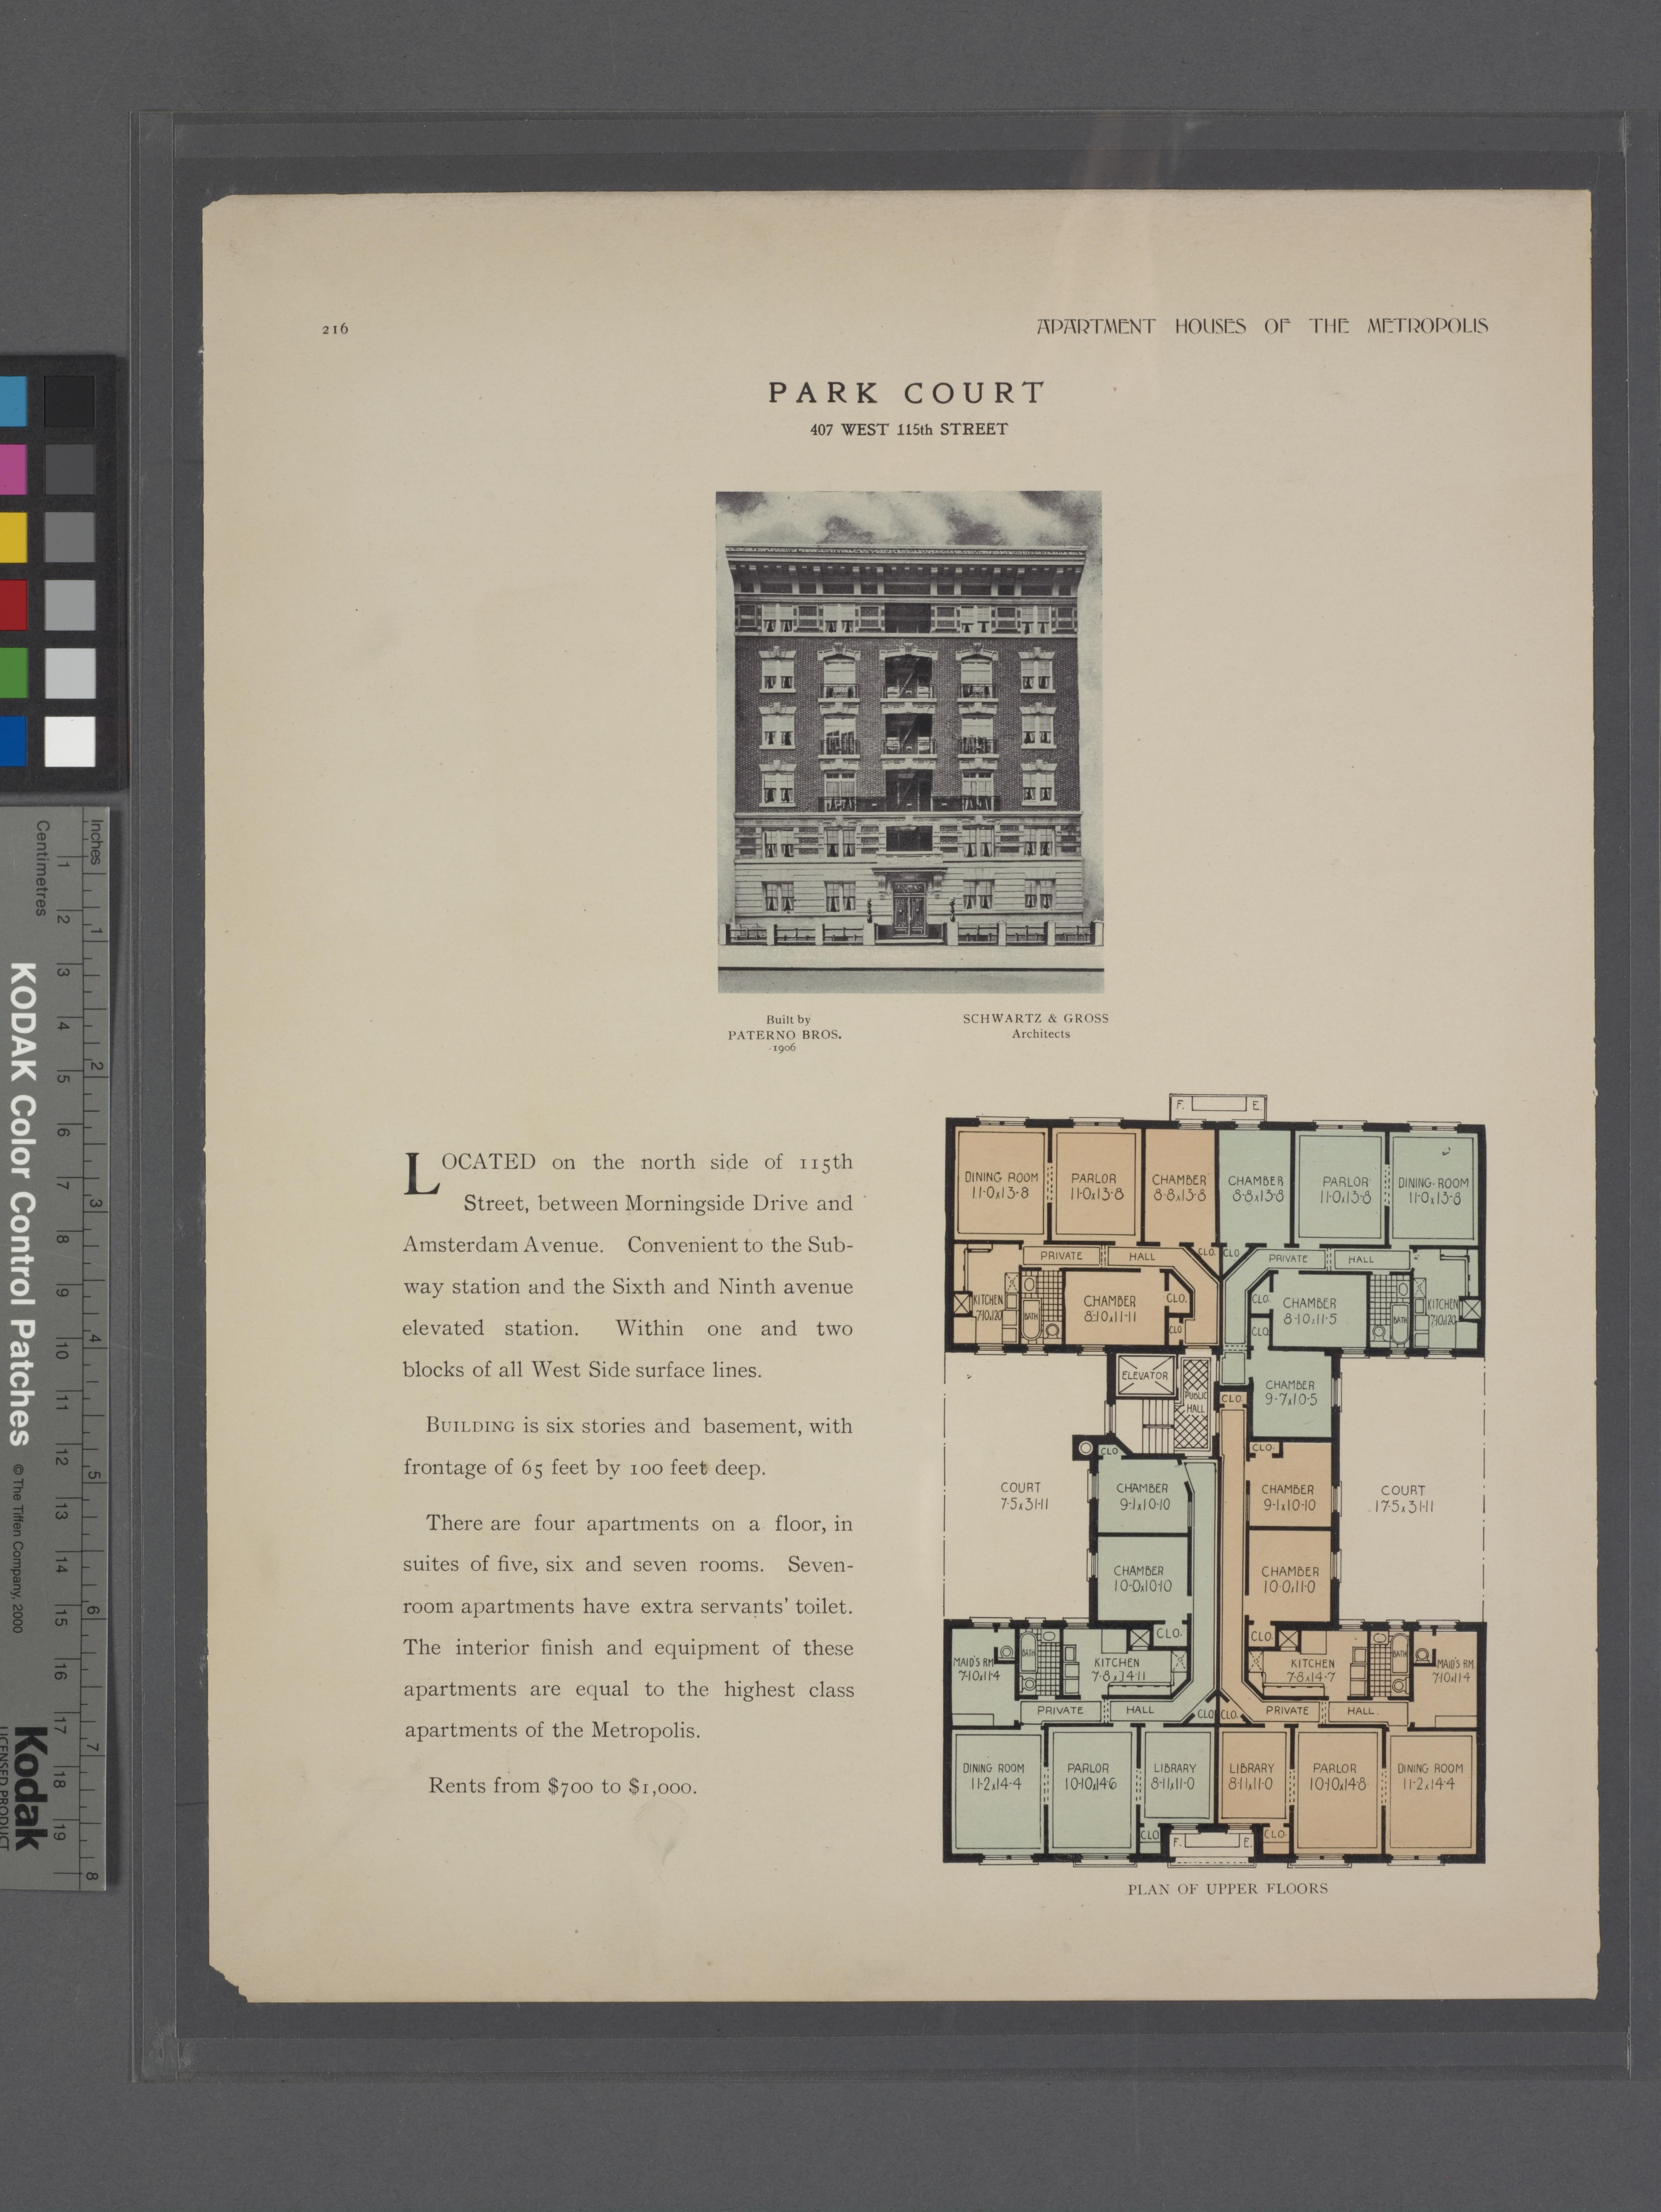 Filepark Court 407 West 115th Street Plan Of Upper Floors Nypl Schematic Diagram 7230